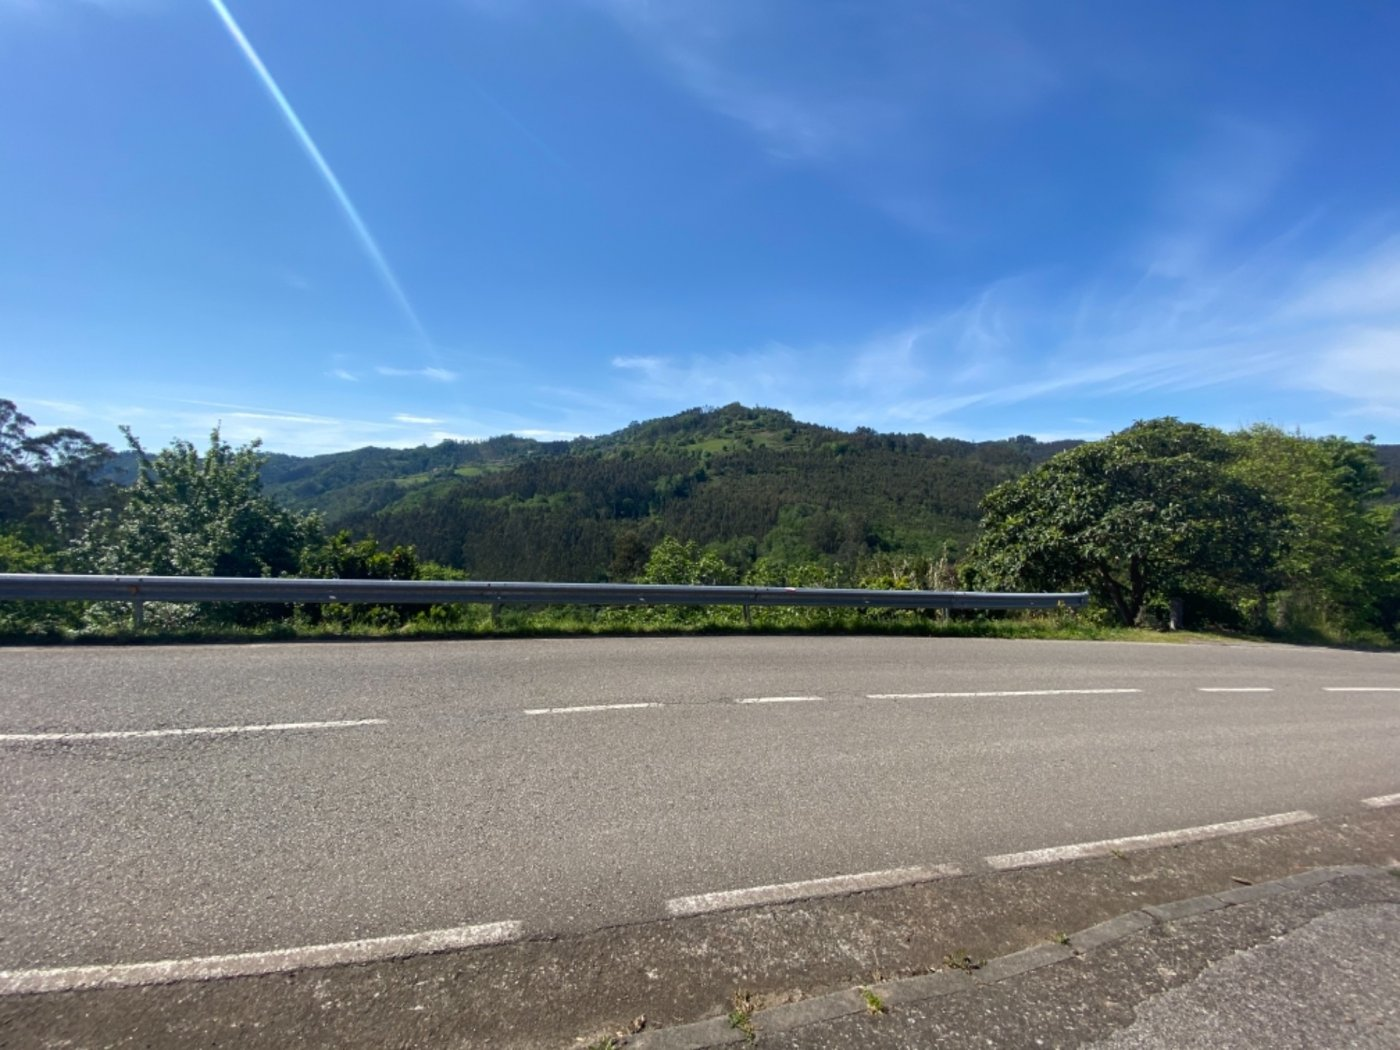 Cuadra para rehabilitar a 5 kilómetros de villaviciosa - imagenInmueble6